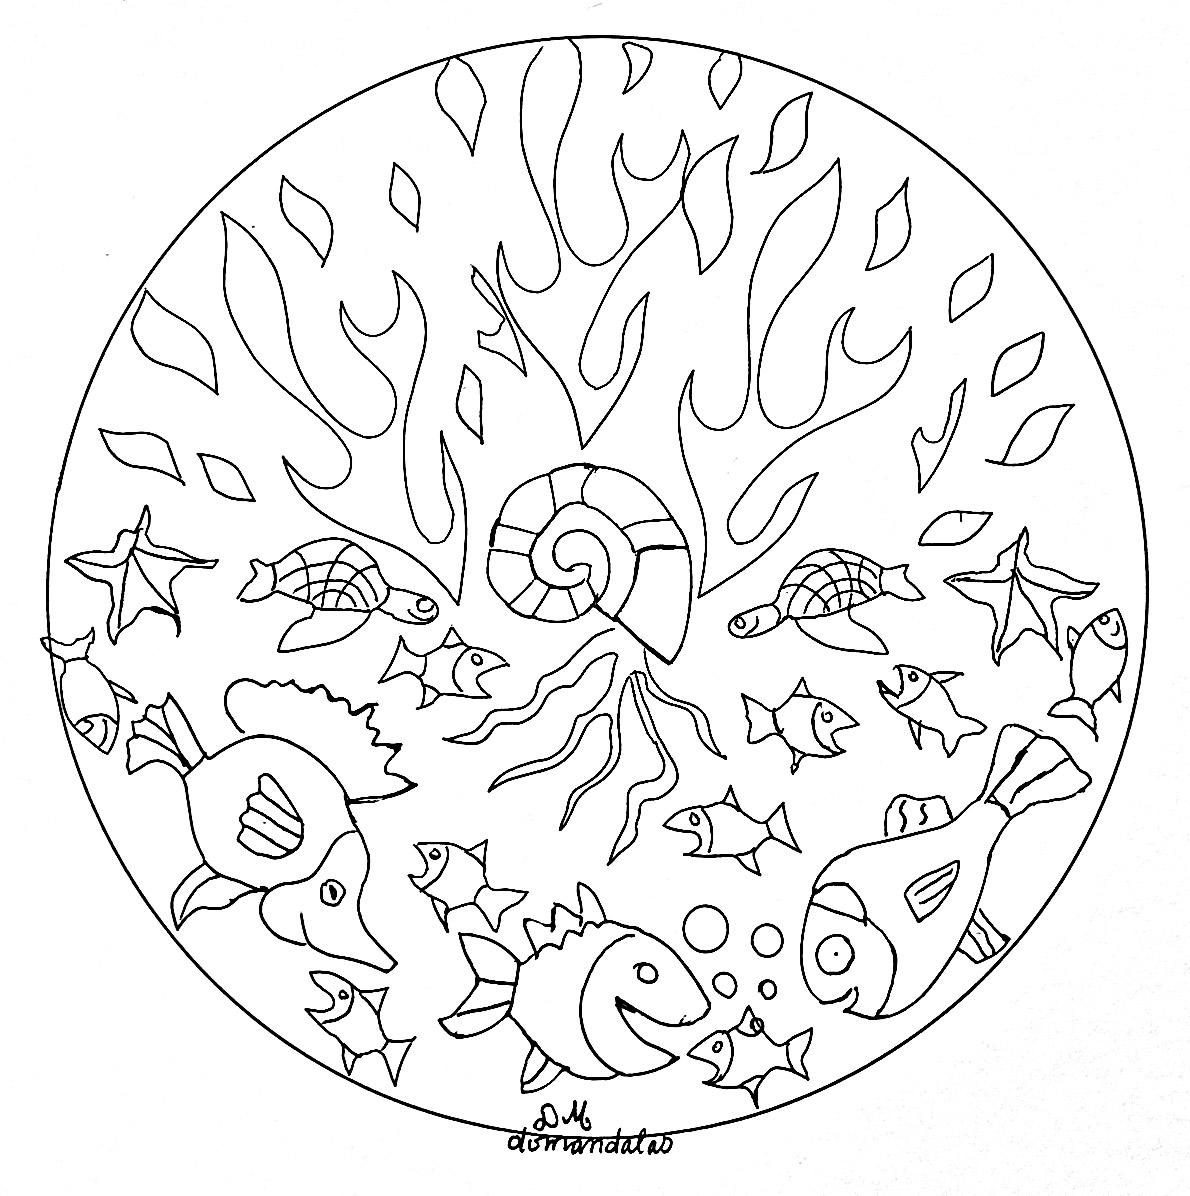 Mandala domandalas seabed